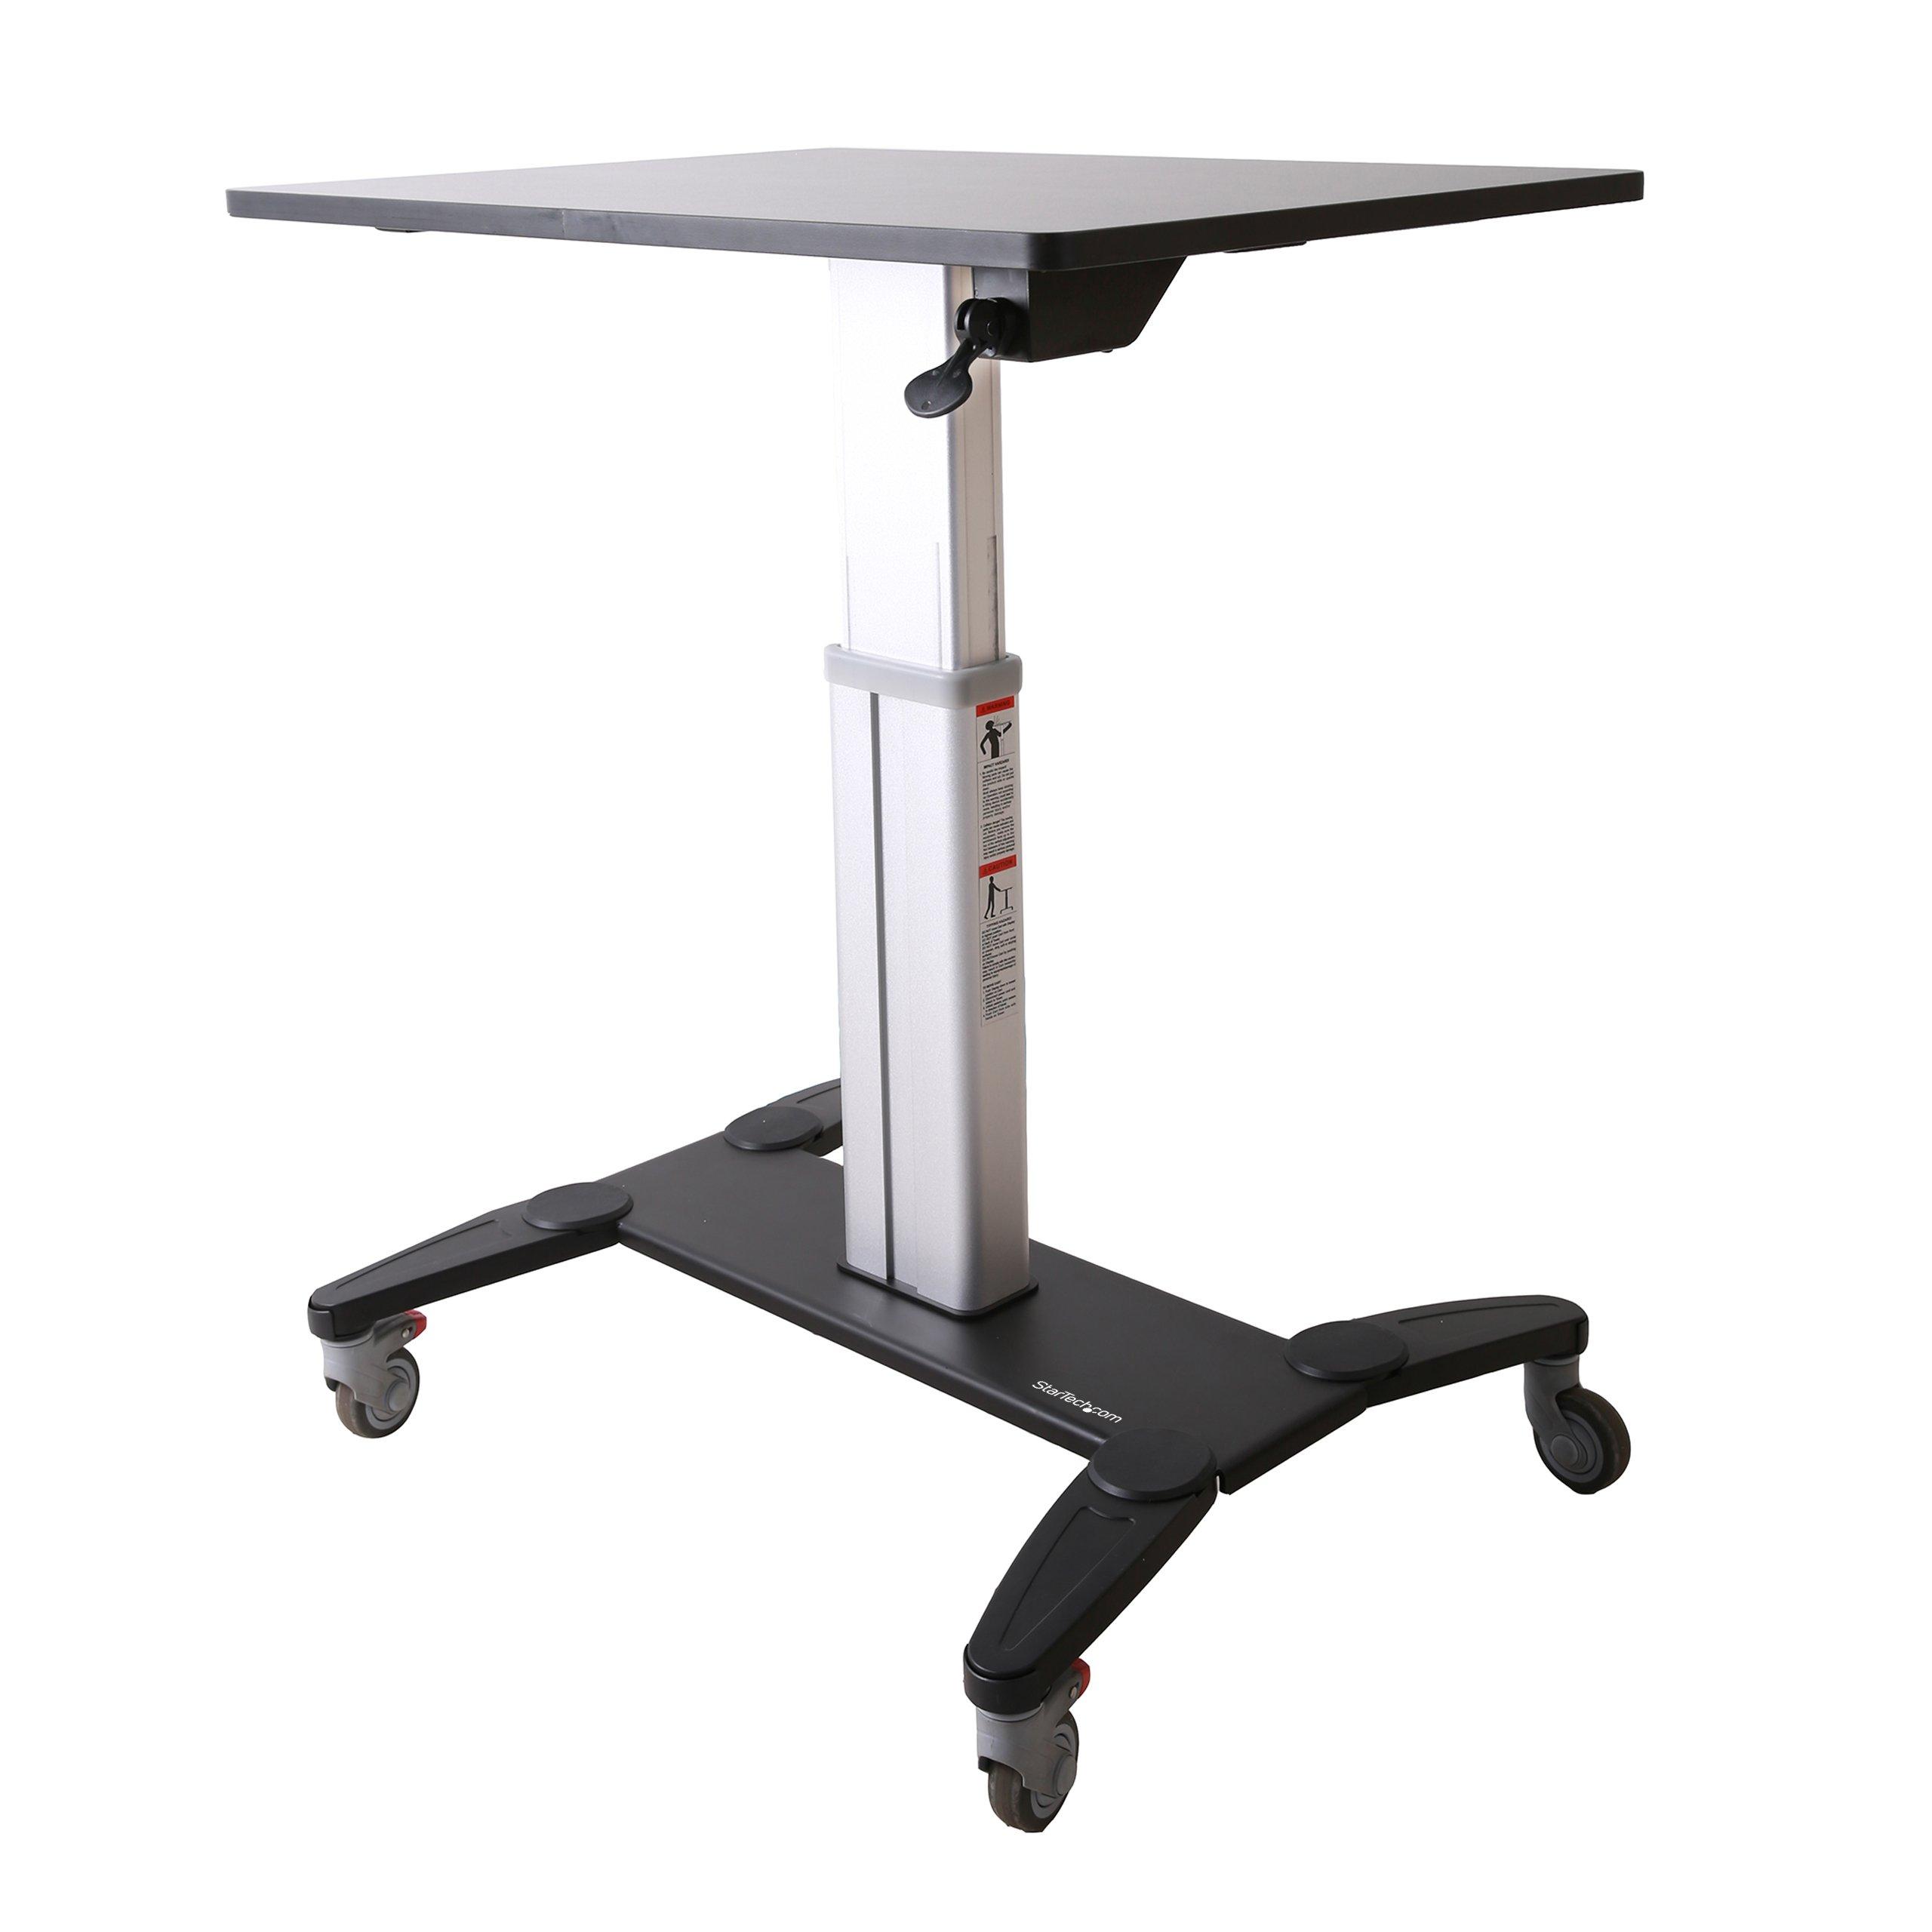 StarTech.com Sit Stand Mobile Workstation - Rolling Desk - One-Touch Height Adjustment with Lock - Standing Desk Converter - Mobile Desk